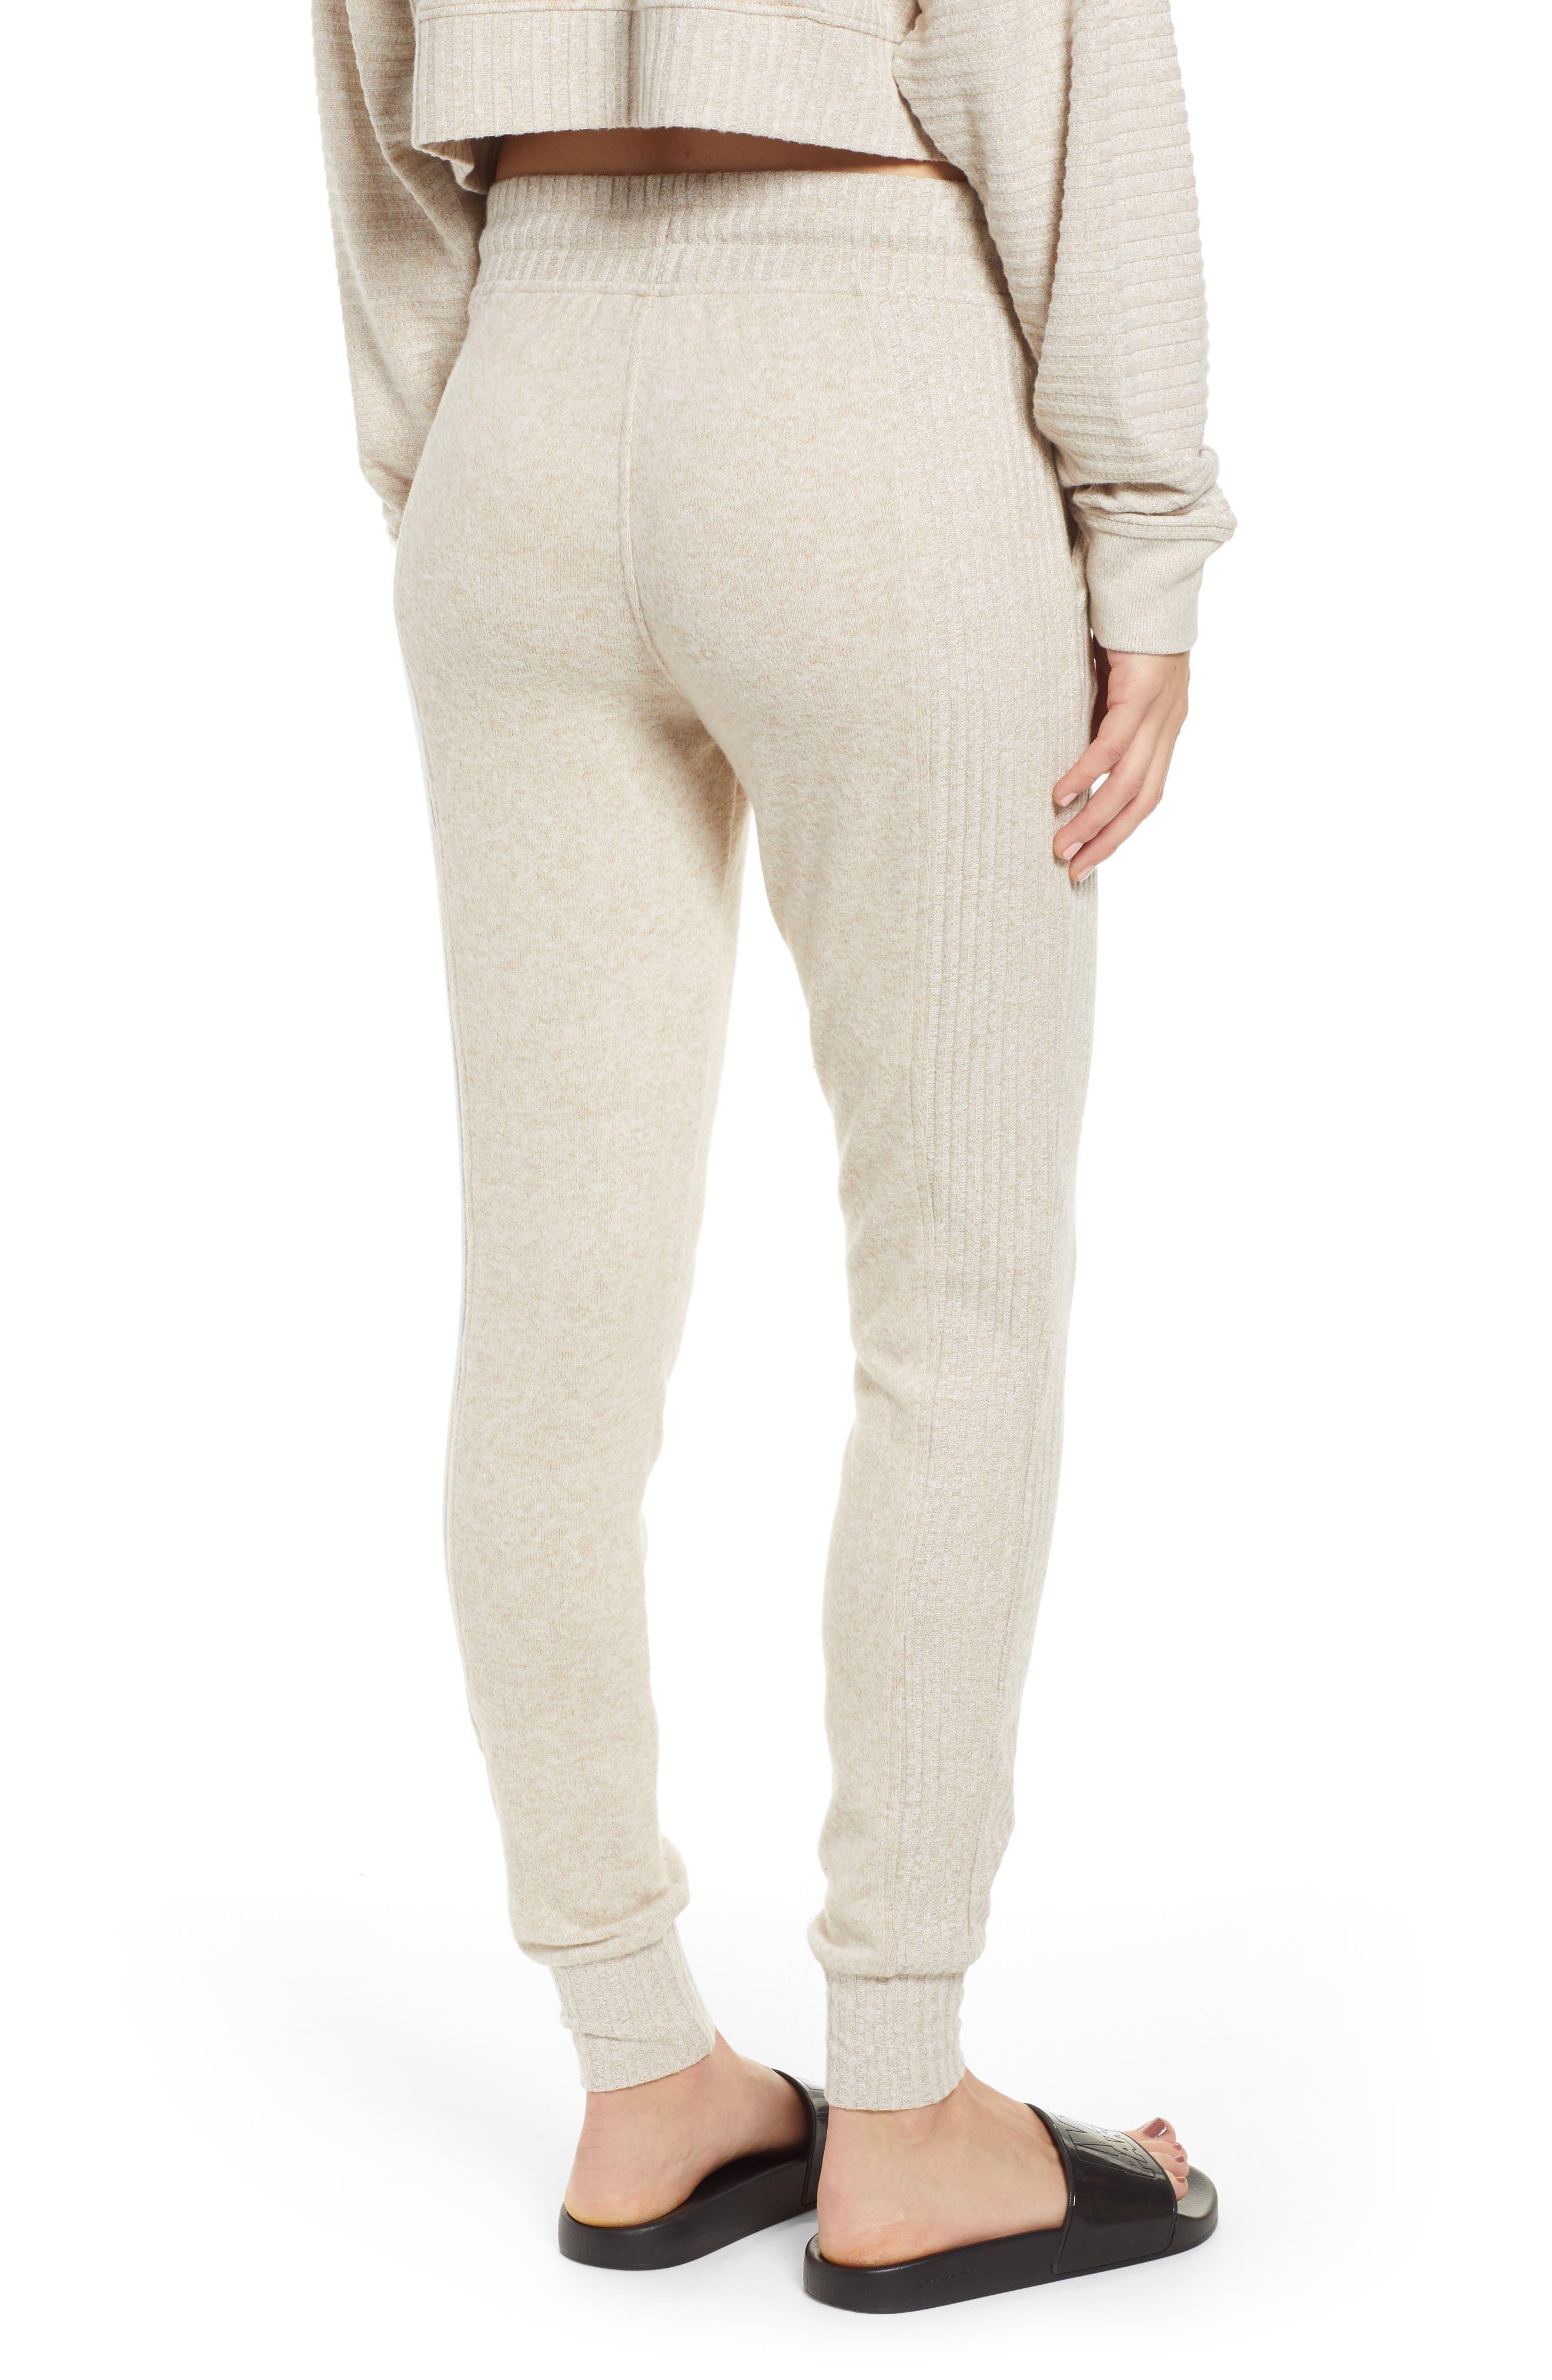 120c5f83b9 Women's IVY PARK® Clothing | Nordstrom